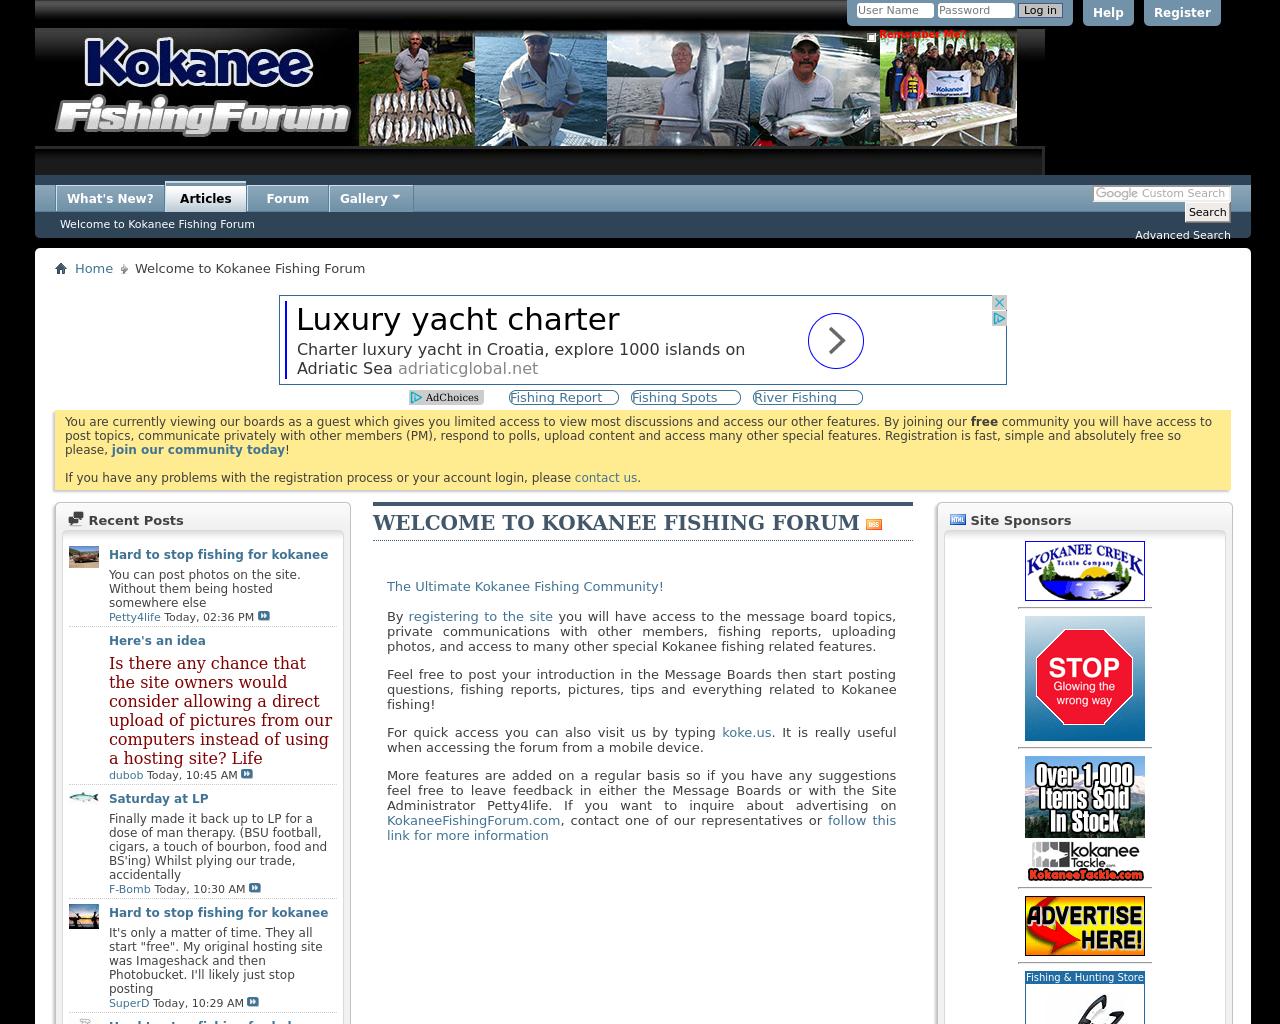 Kokanee-Fishing-Forum-Advertising-Reviews-Pricing